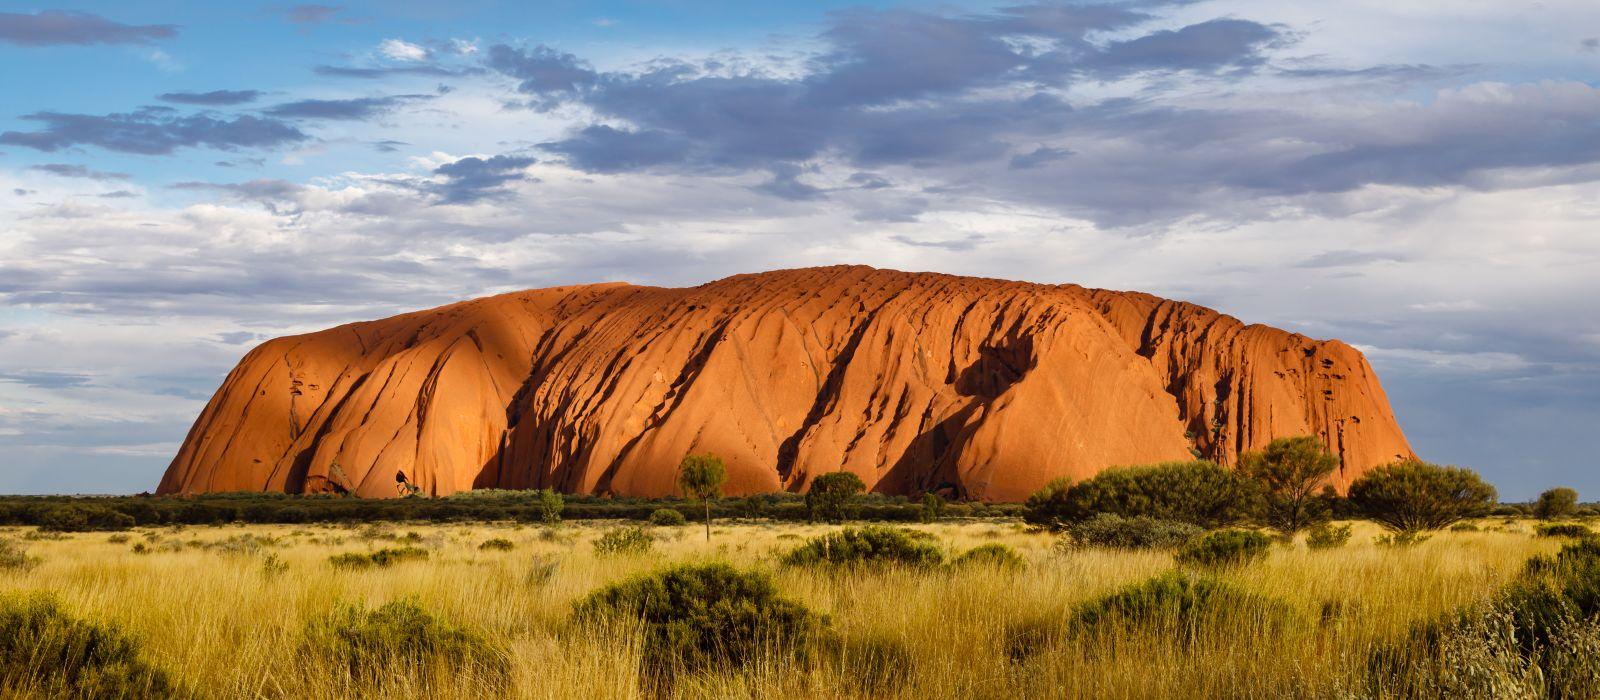 Hotel Longitude 131° Australien